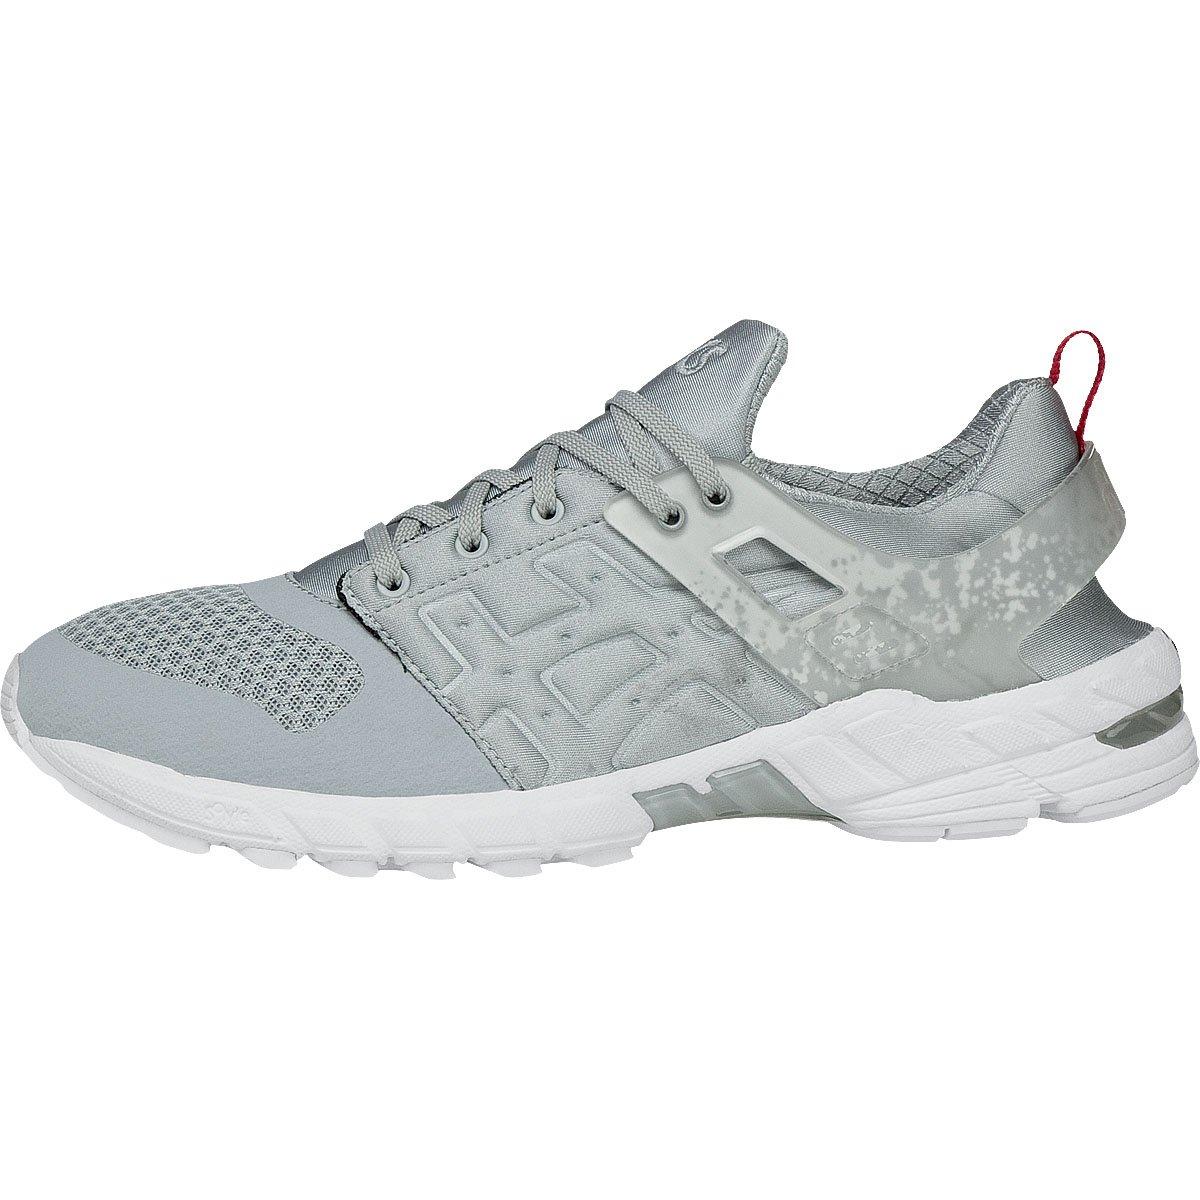 ASICS GT DS Retro Running Shoe B019PZE9RA 11 M US Women / 9.5 M US Men|Light Grey/Light Grey